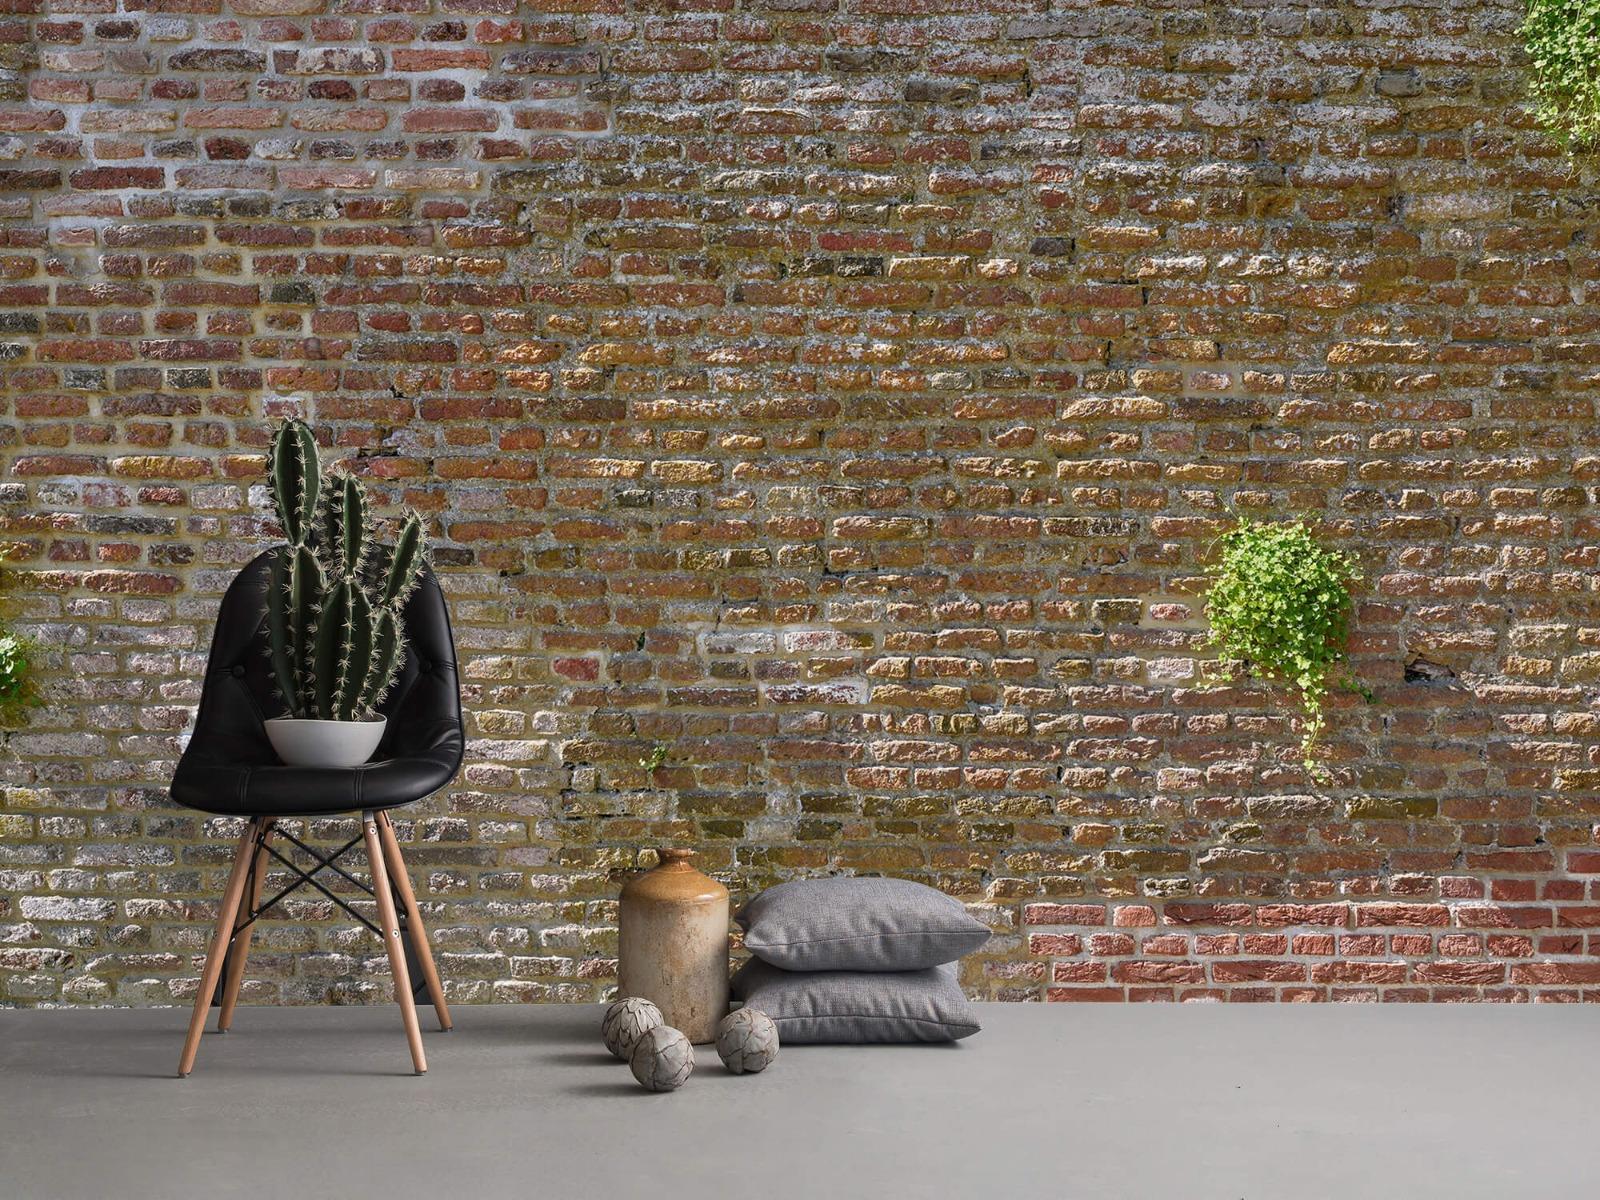 Stenen - Oude stenen stadsmuur met plantjes 13